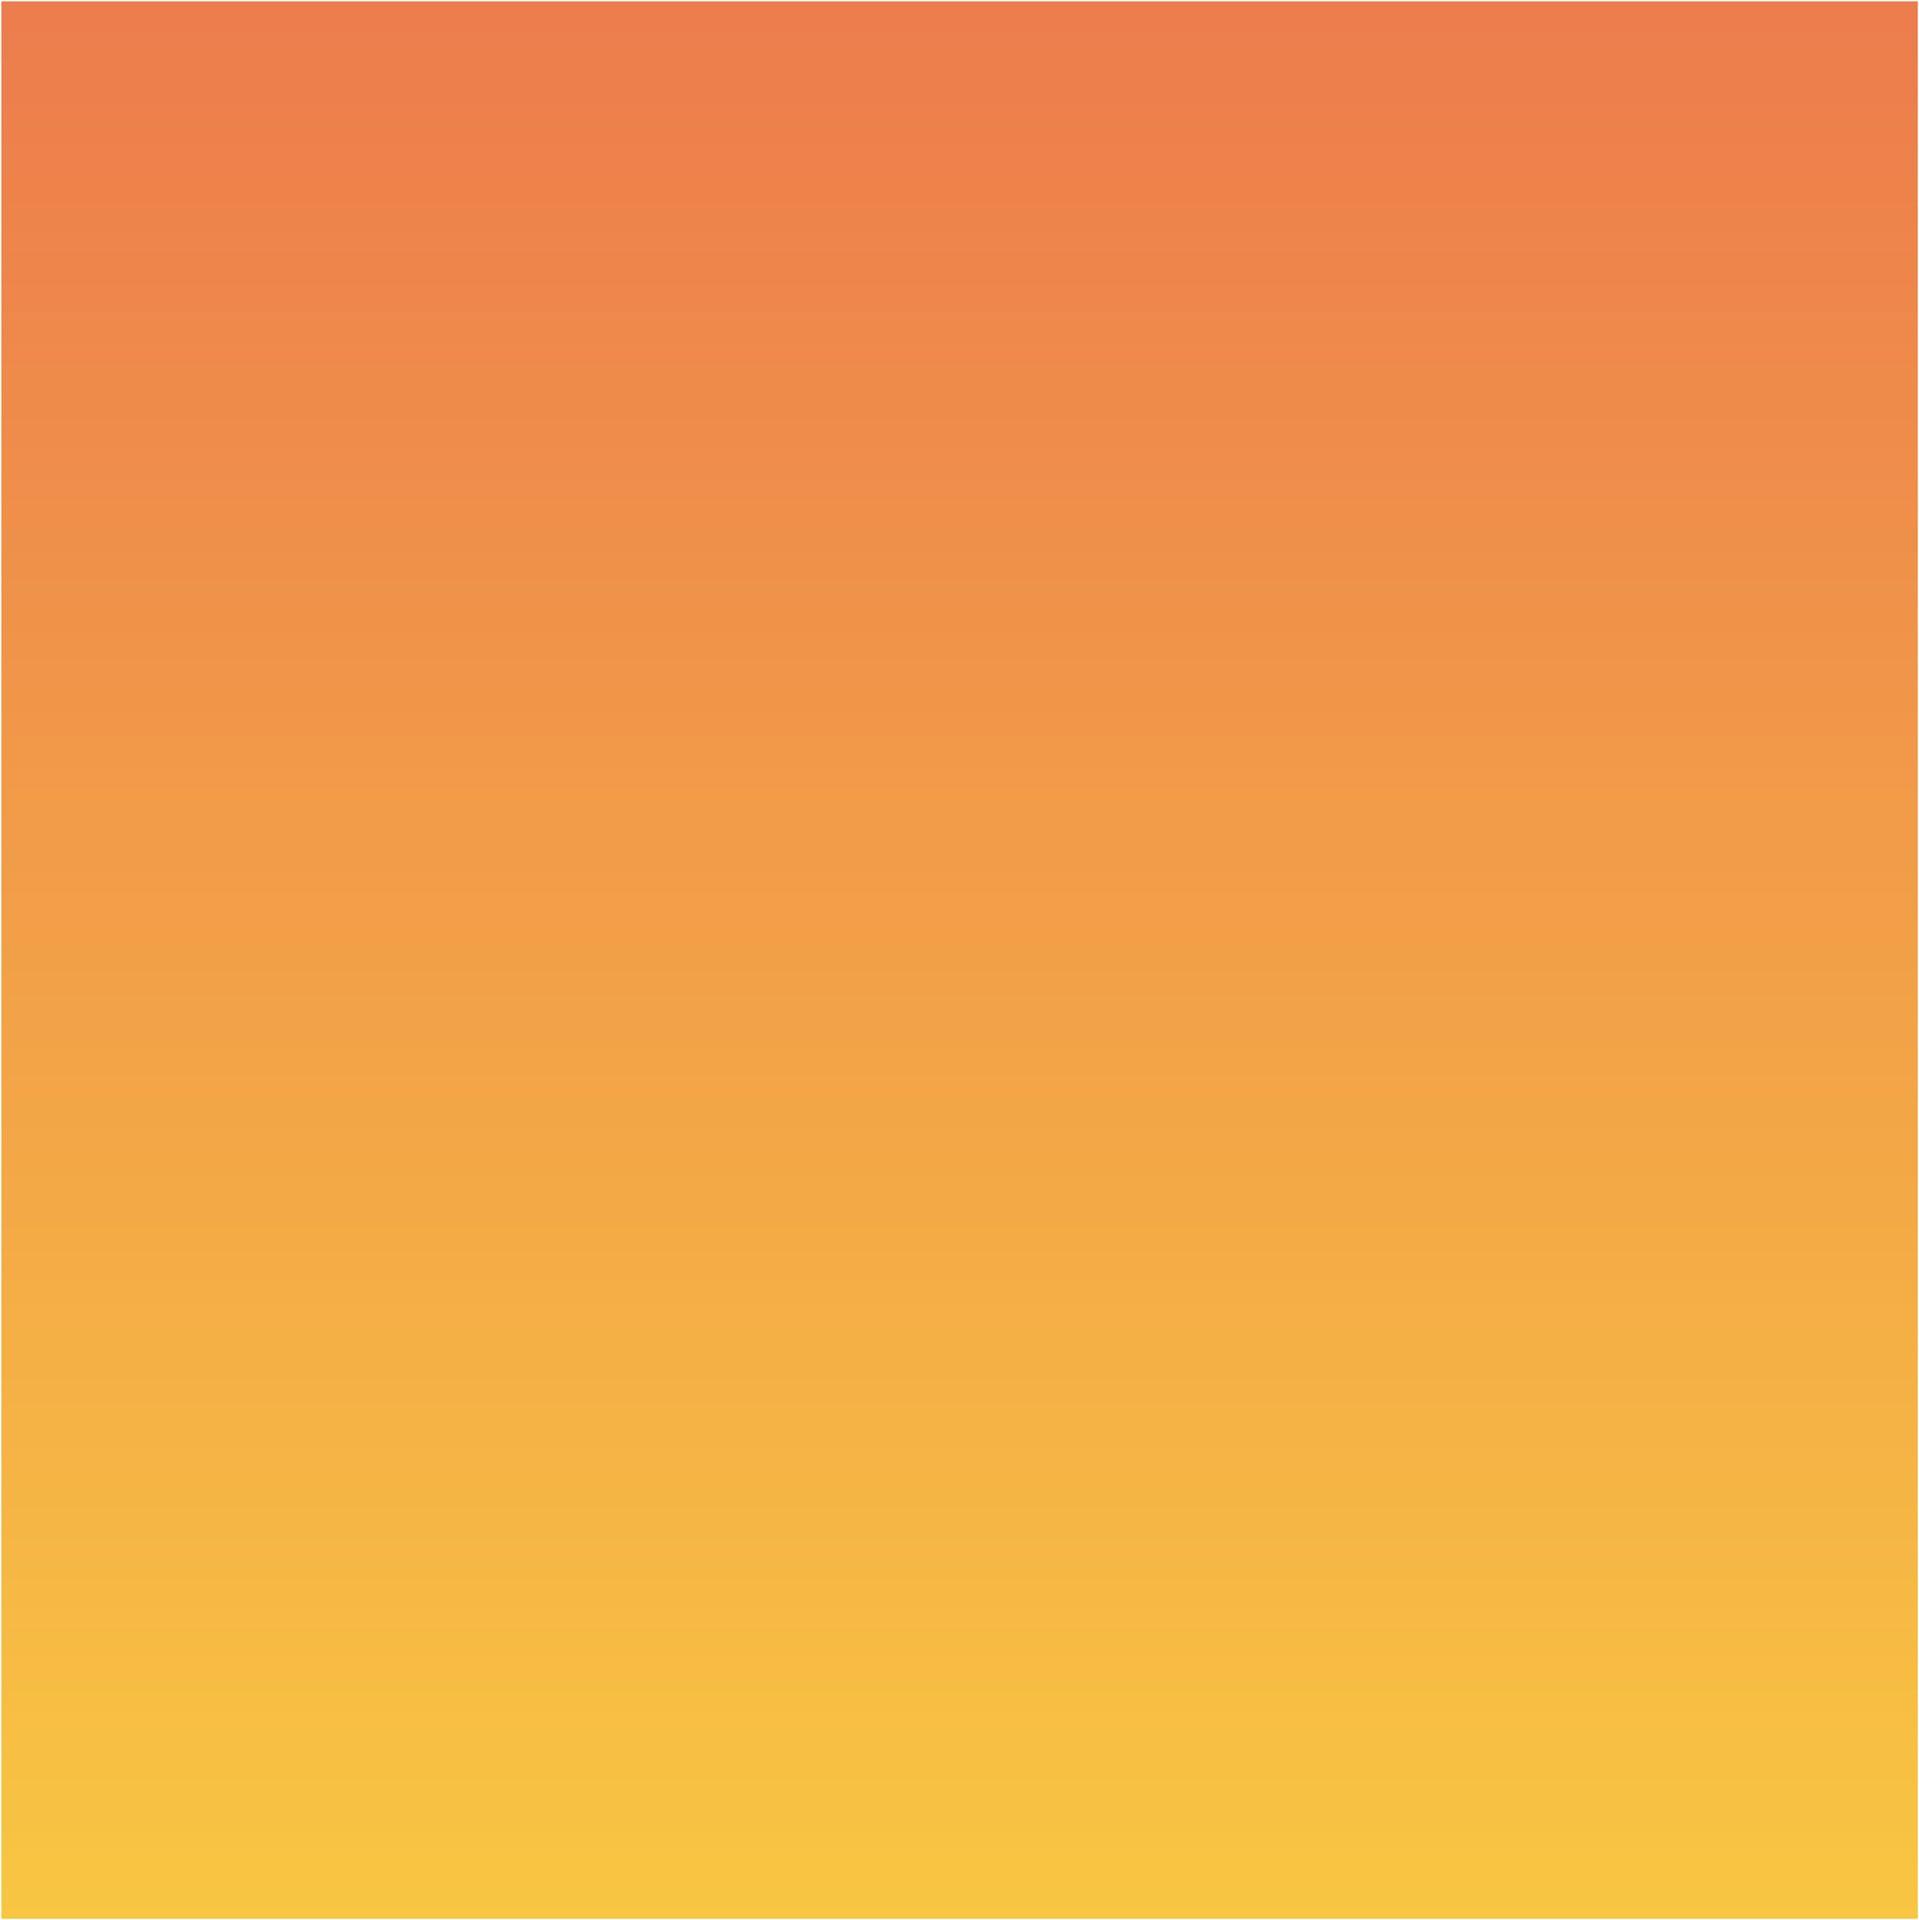 Orange Wallpaper Hd: Orange Background ·① Download Free HD Backgrounds For